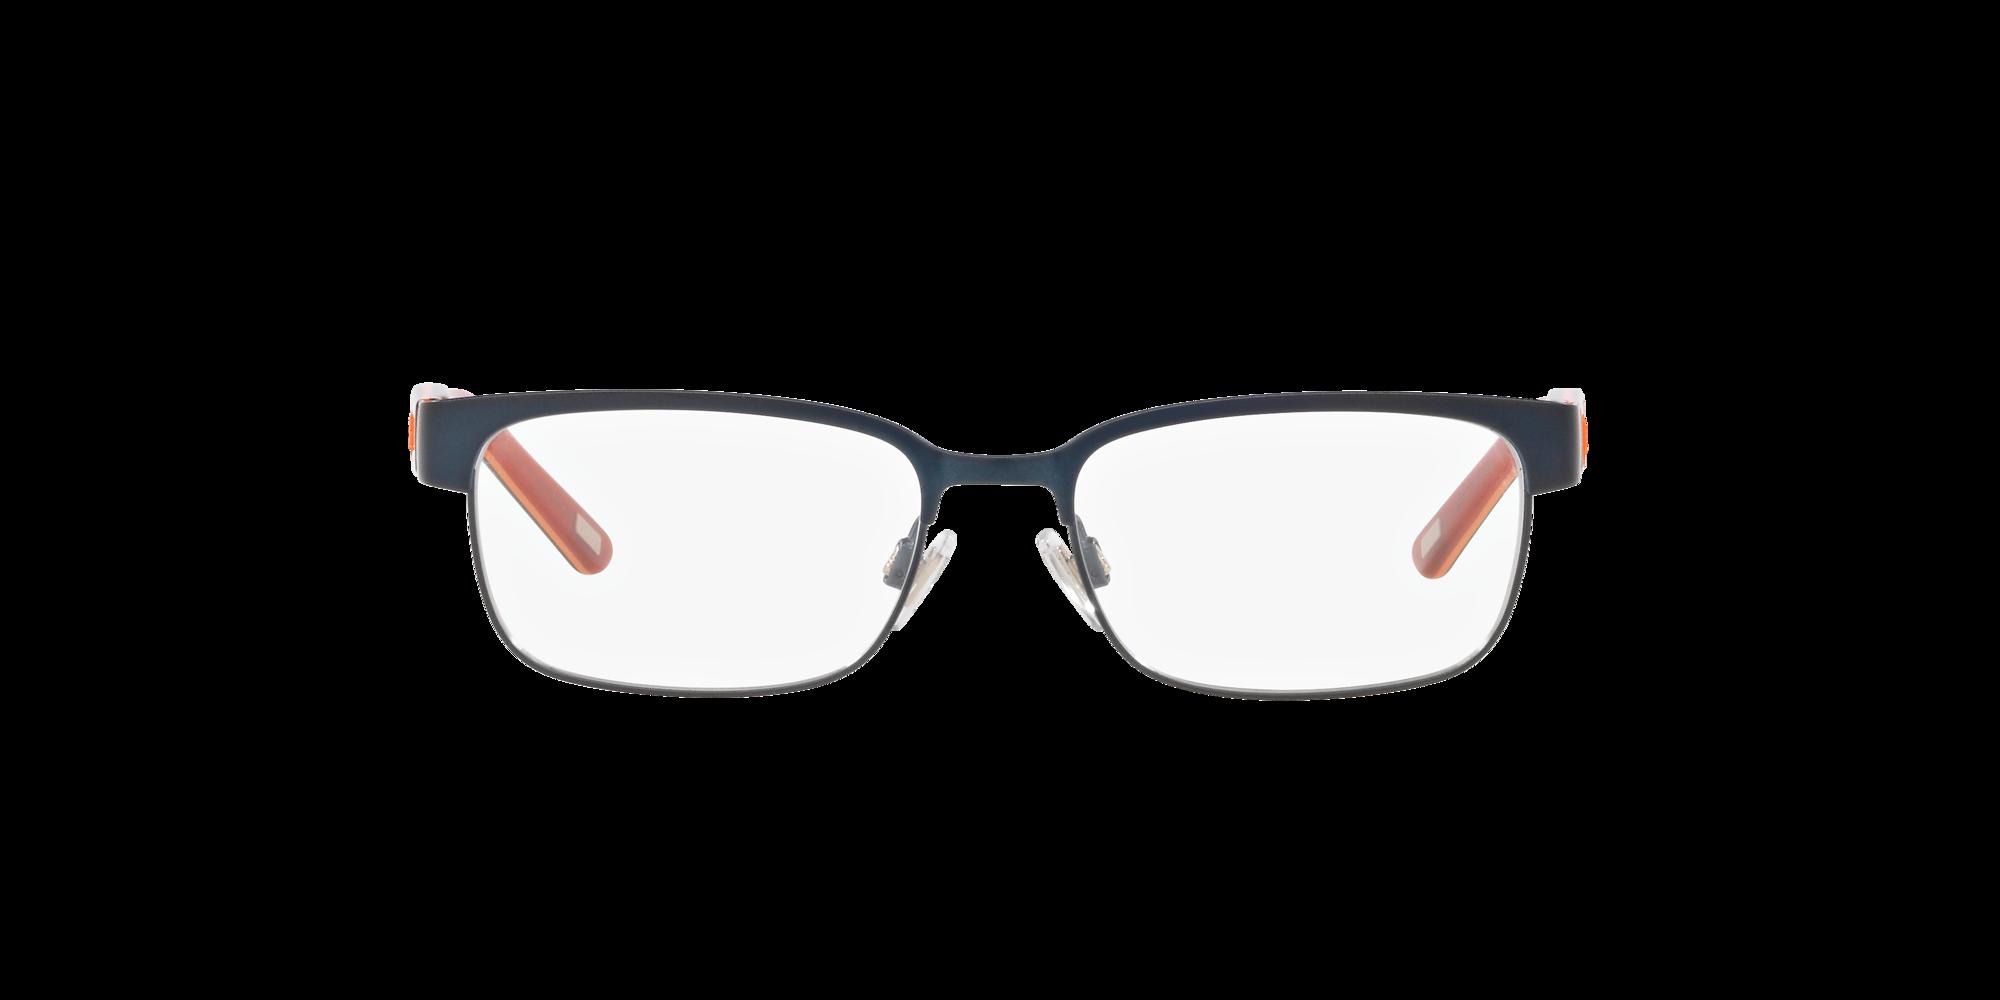 Image for PP8036 from LensCrafters | Glasses, Prescription Glasses Online, Eyewear